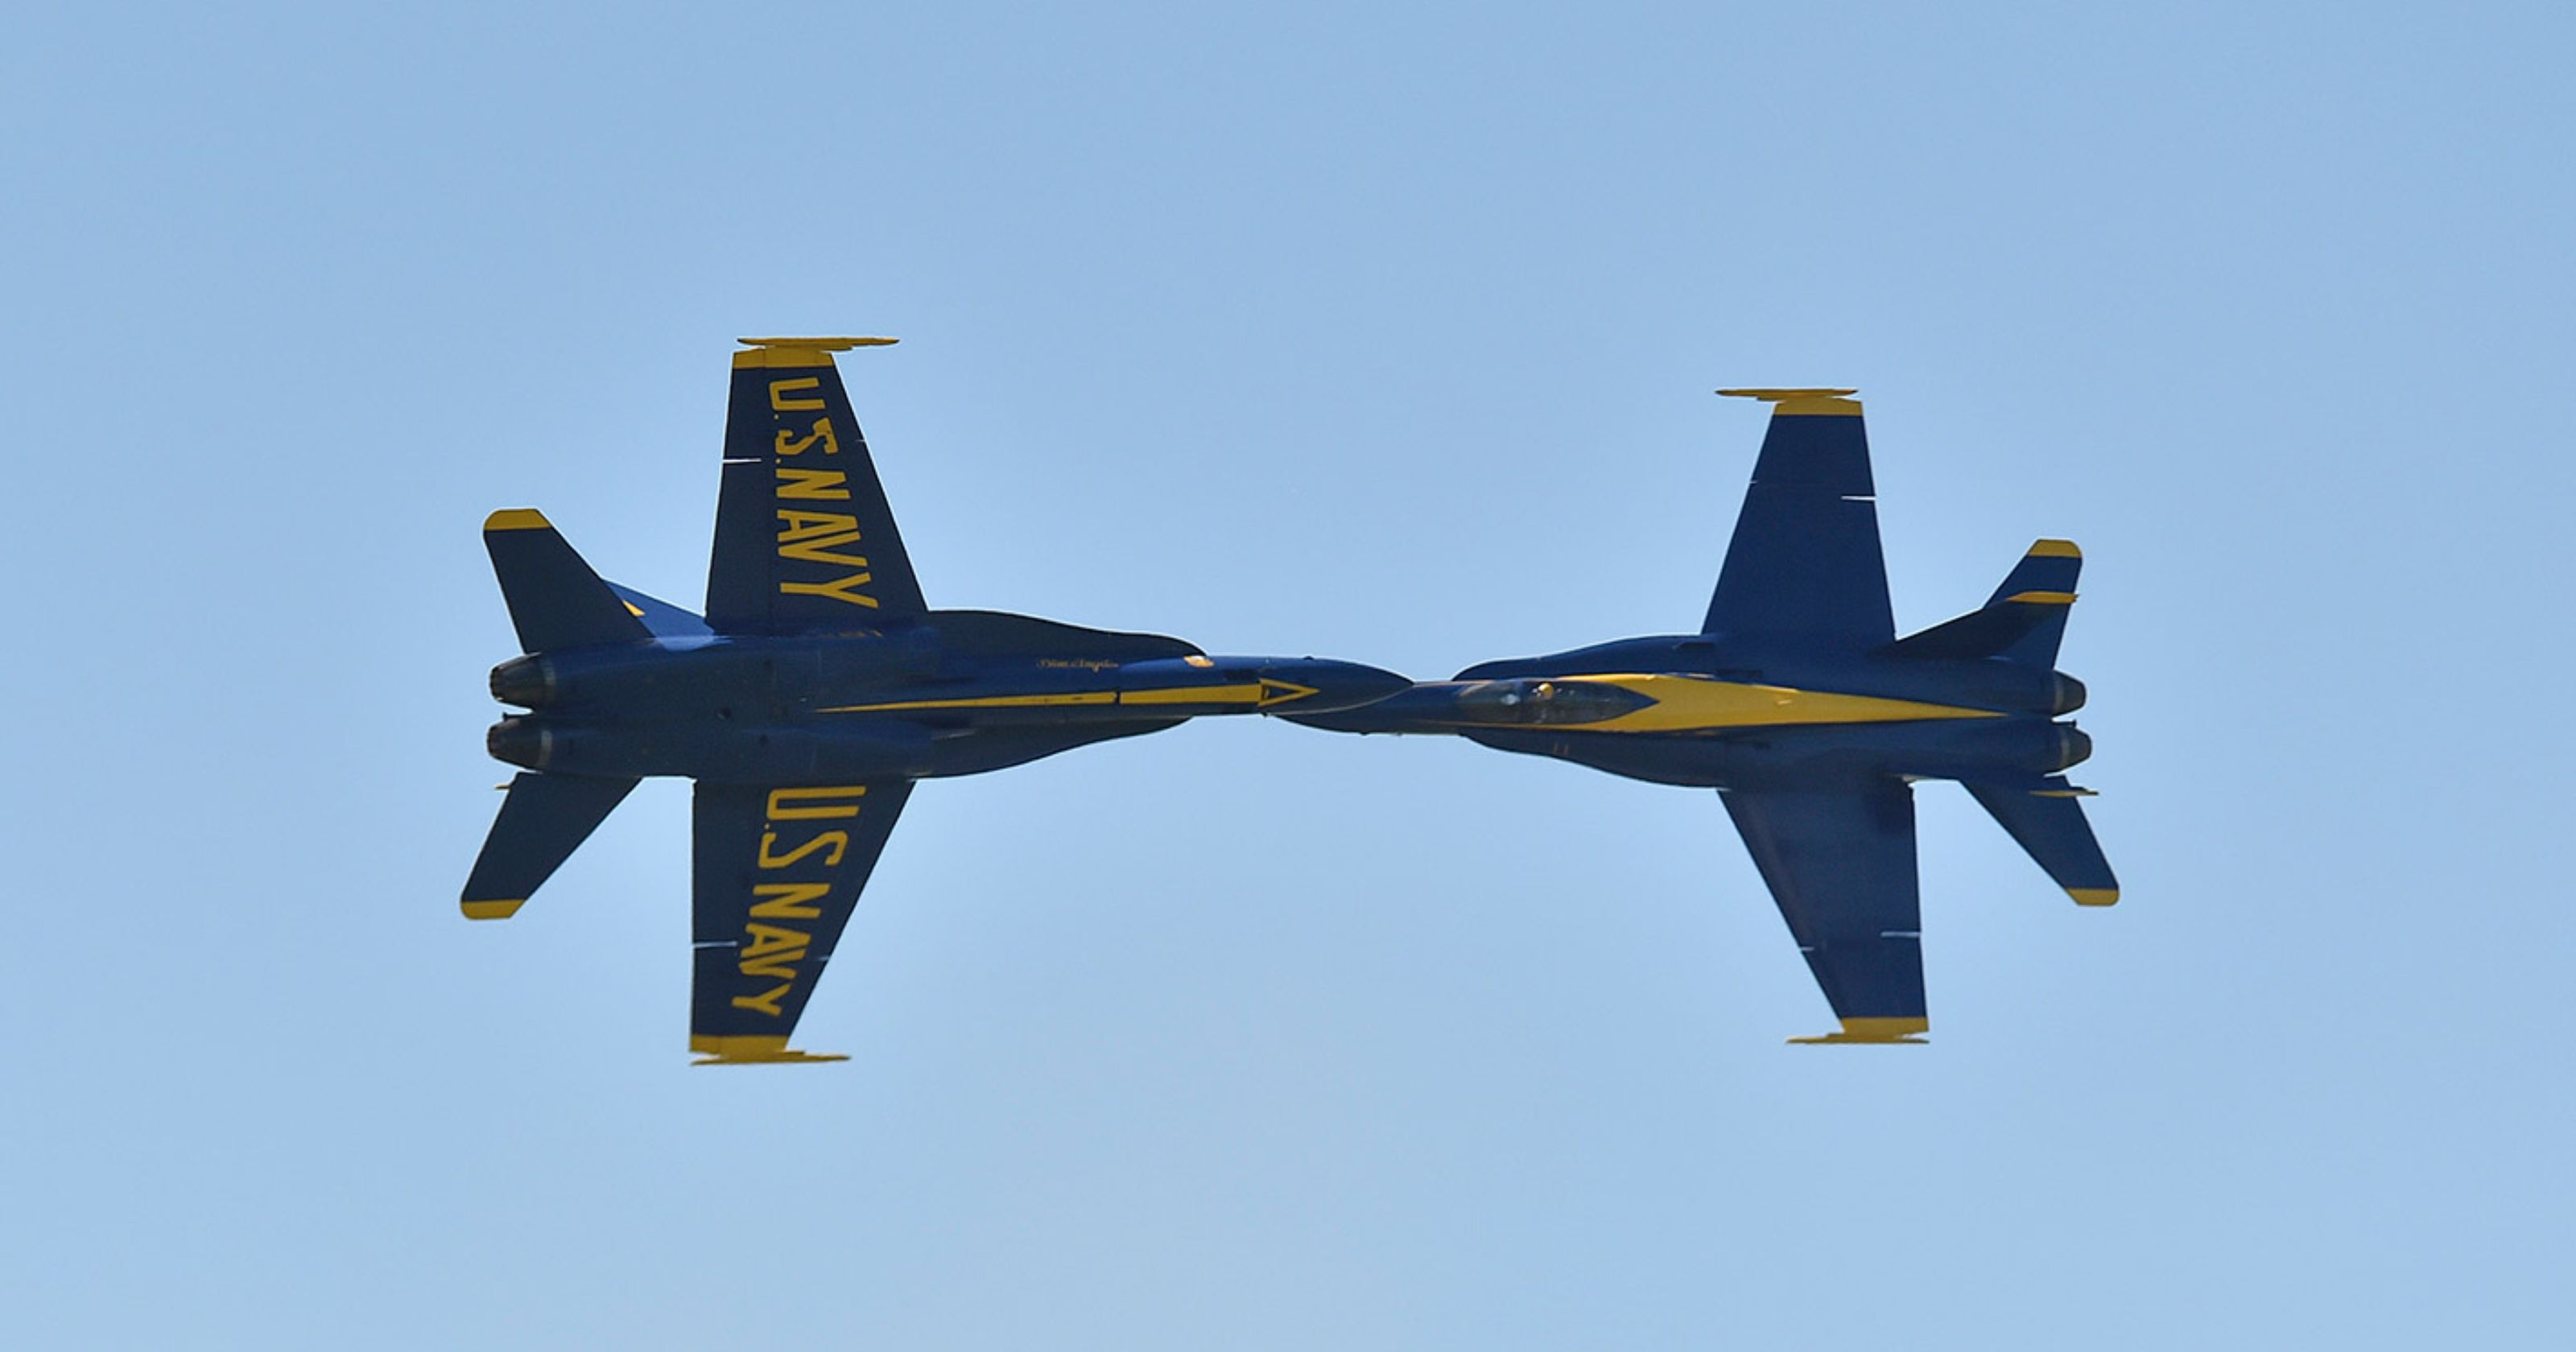 Navy blue angels photo